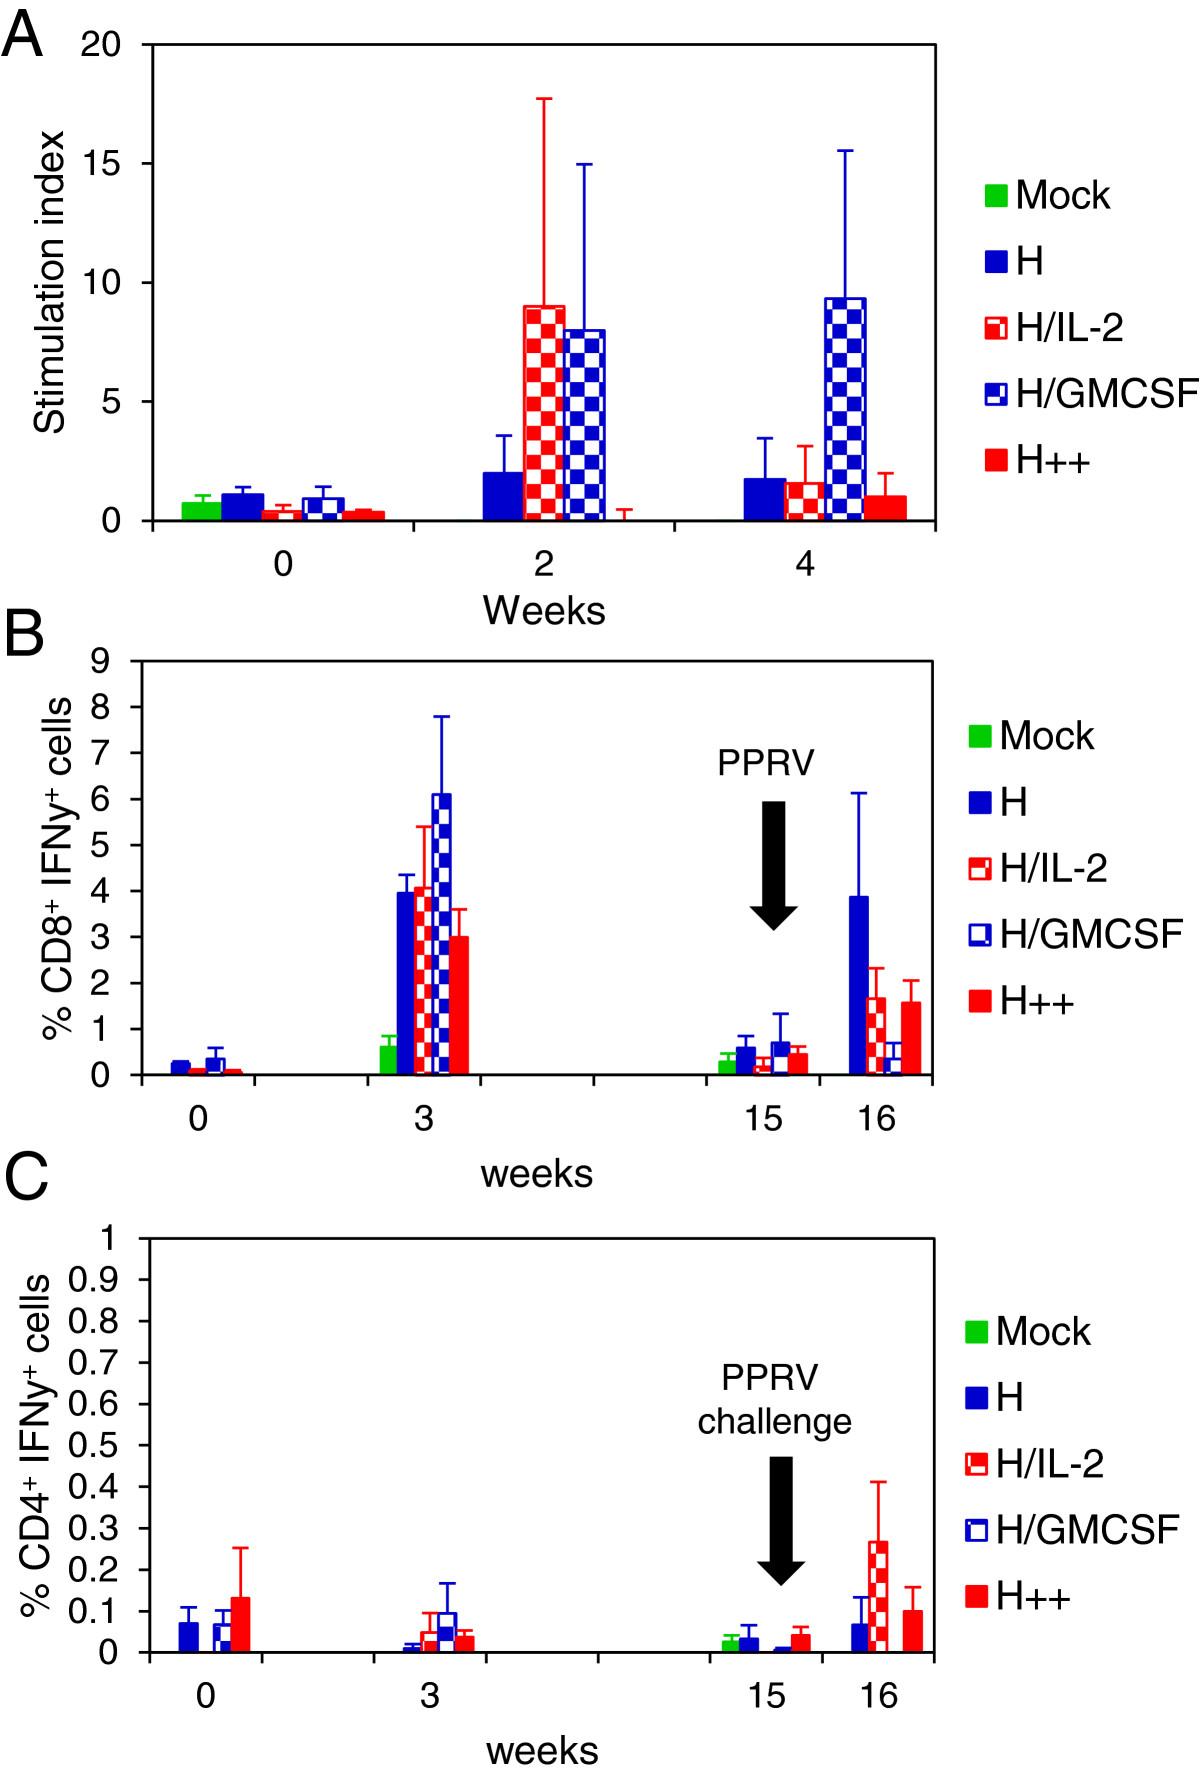 Recombinant adenovirus expressing the haemagglutinin of